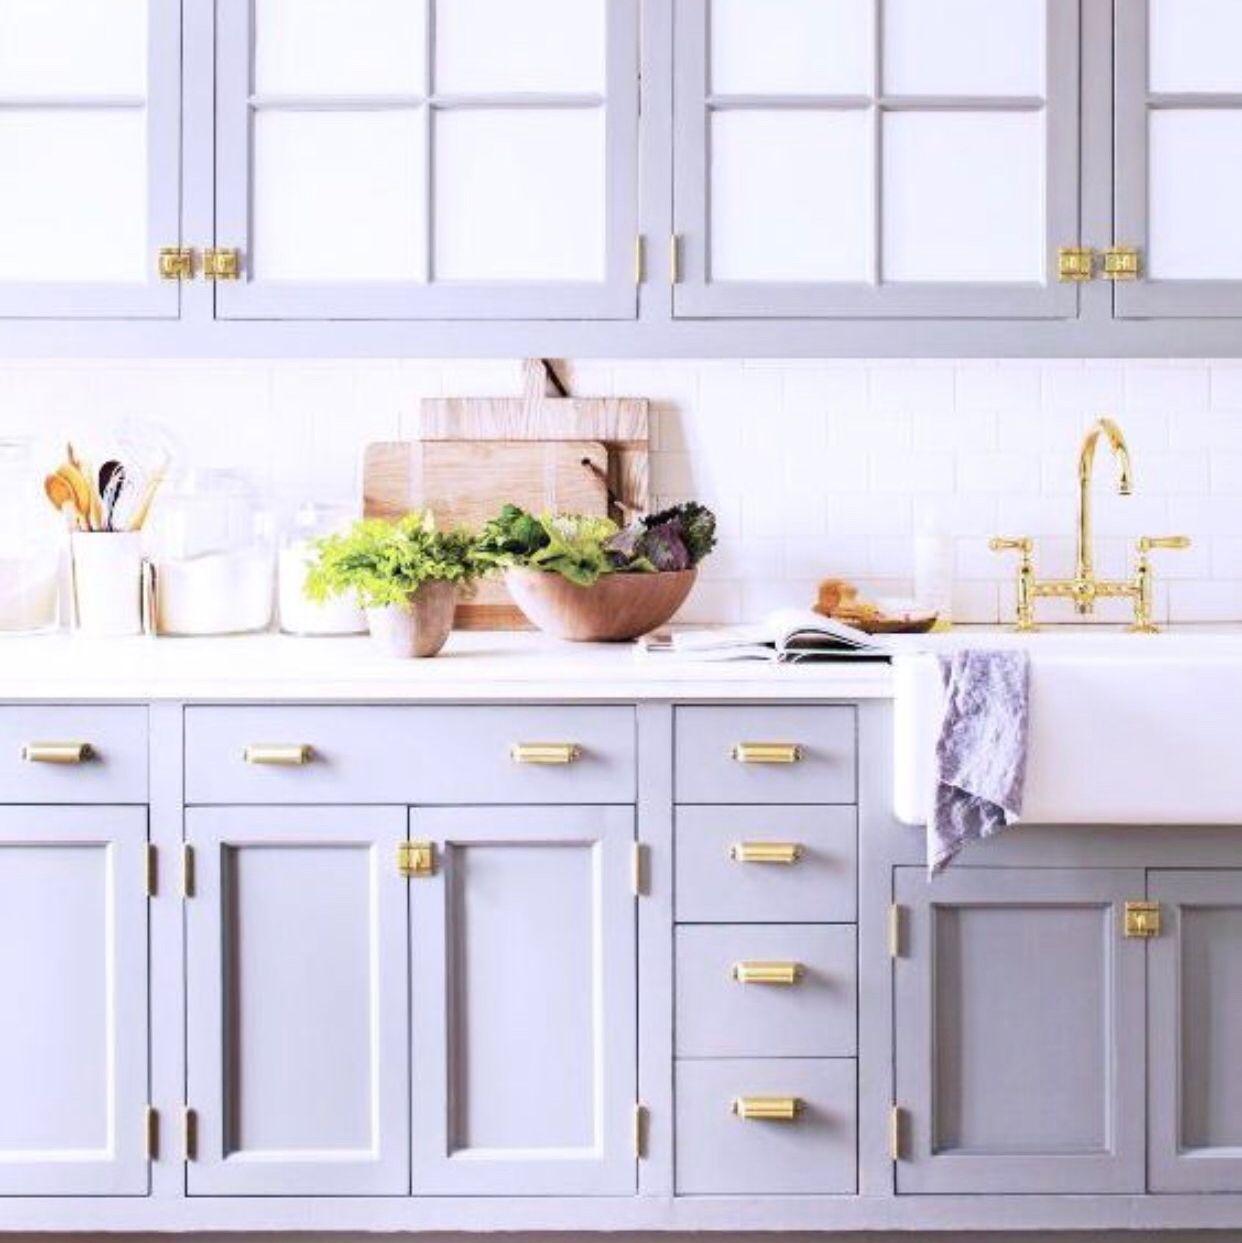 Commercial Interior Design Blue Gray Kitchen Cabinets Kitchen Cabinet Design Kitchen Design